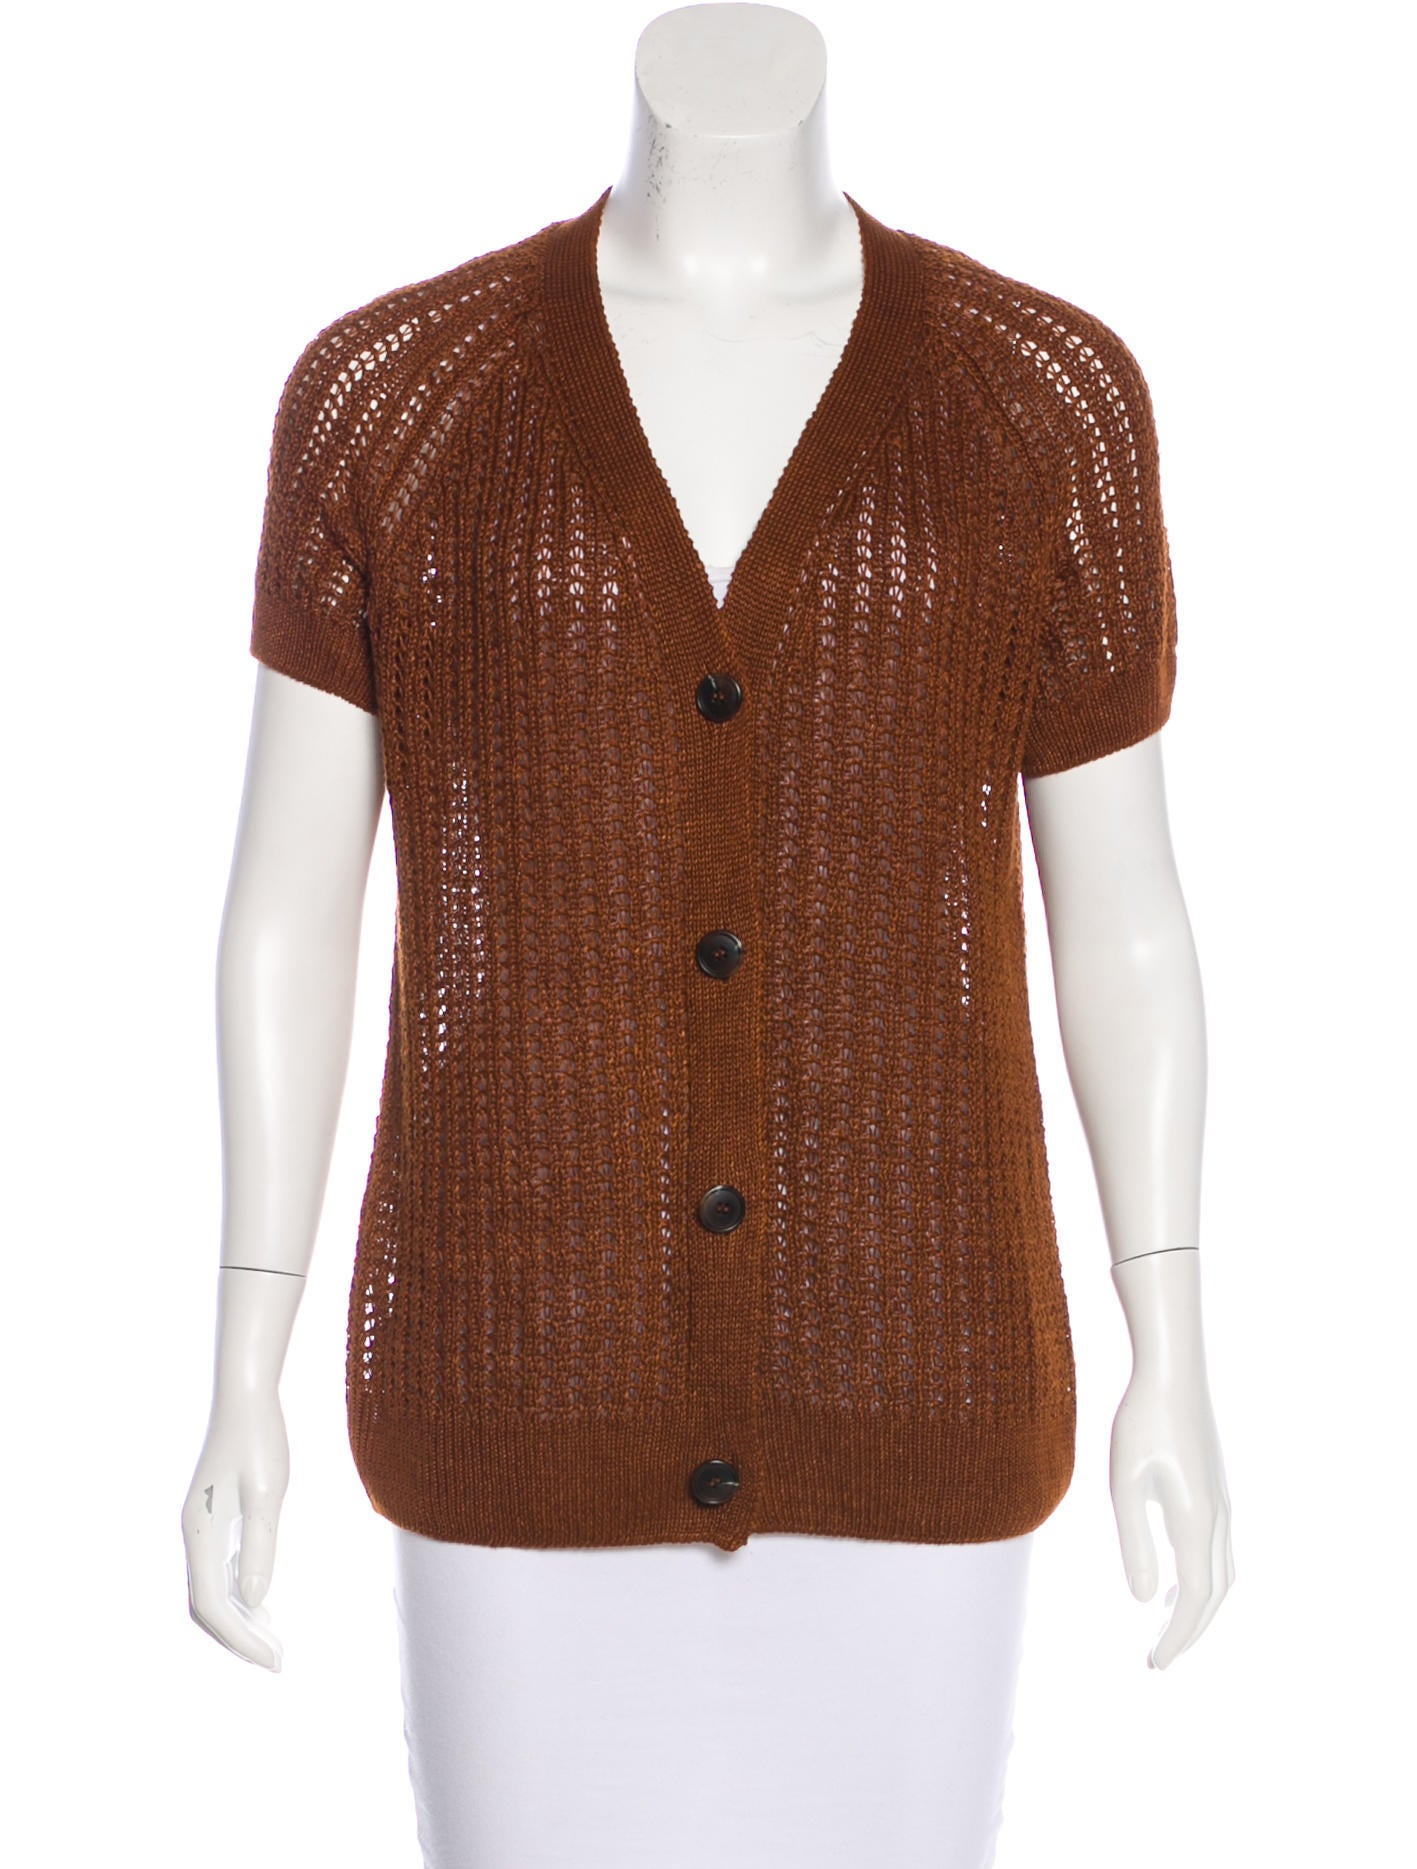 Lafayette 148 Open Knit Short Sleeve Cardigan - Clothing ...